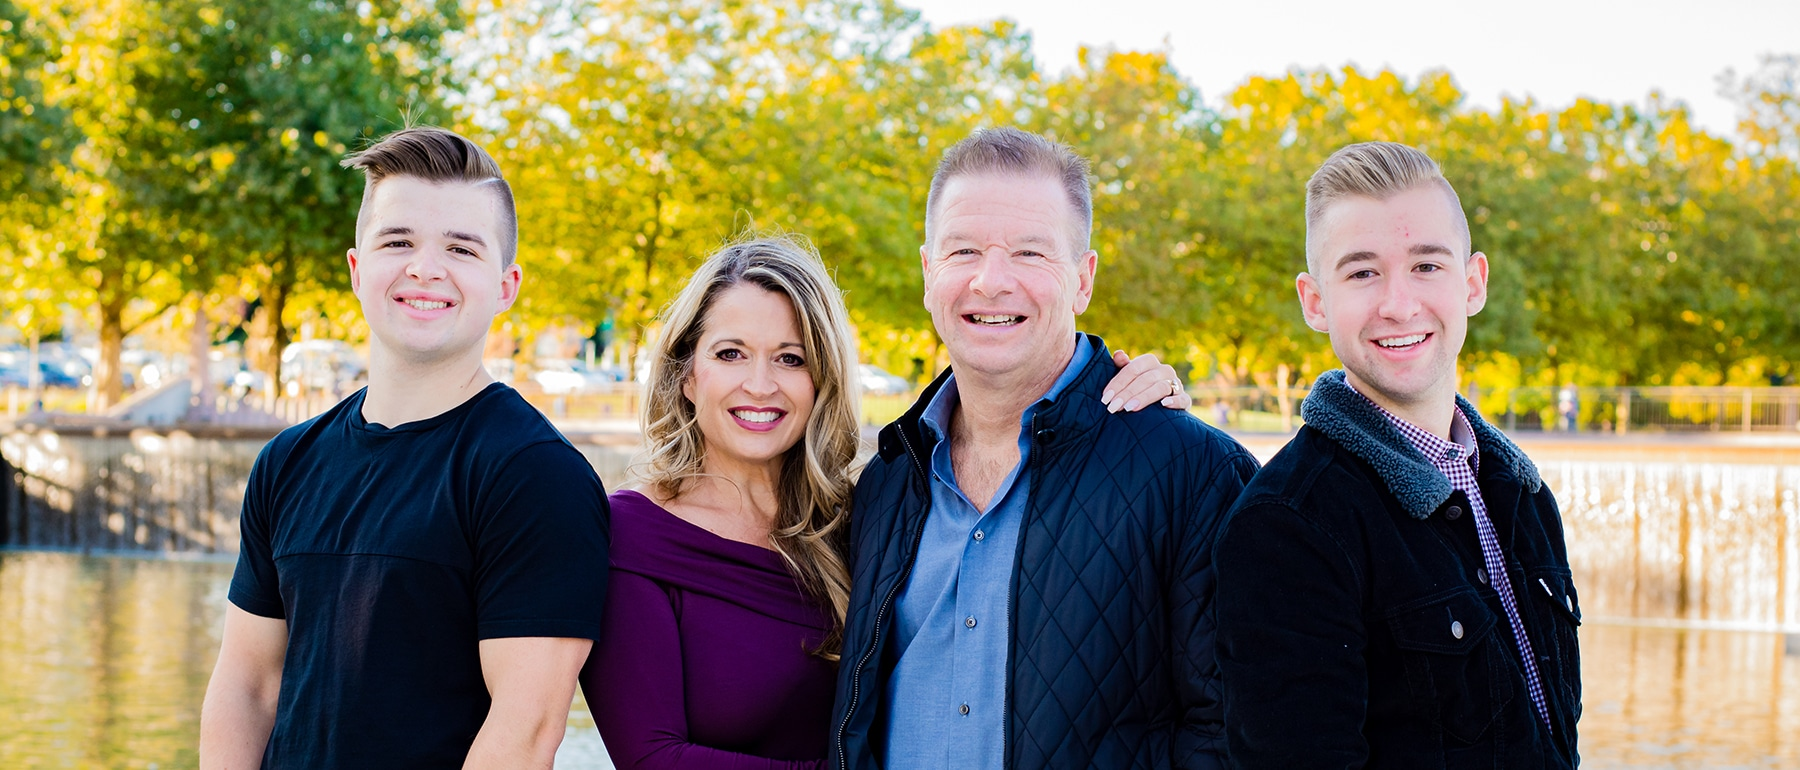 Randy and Raye-Lynn Jassman | Leadership & Mentorship